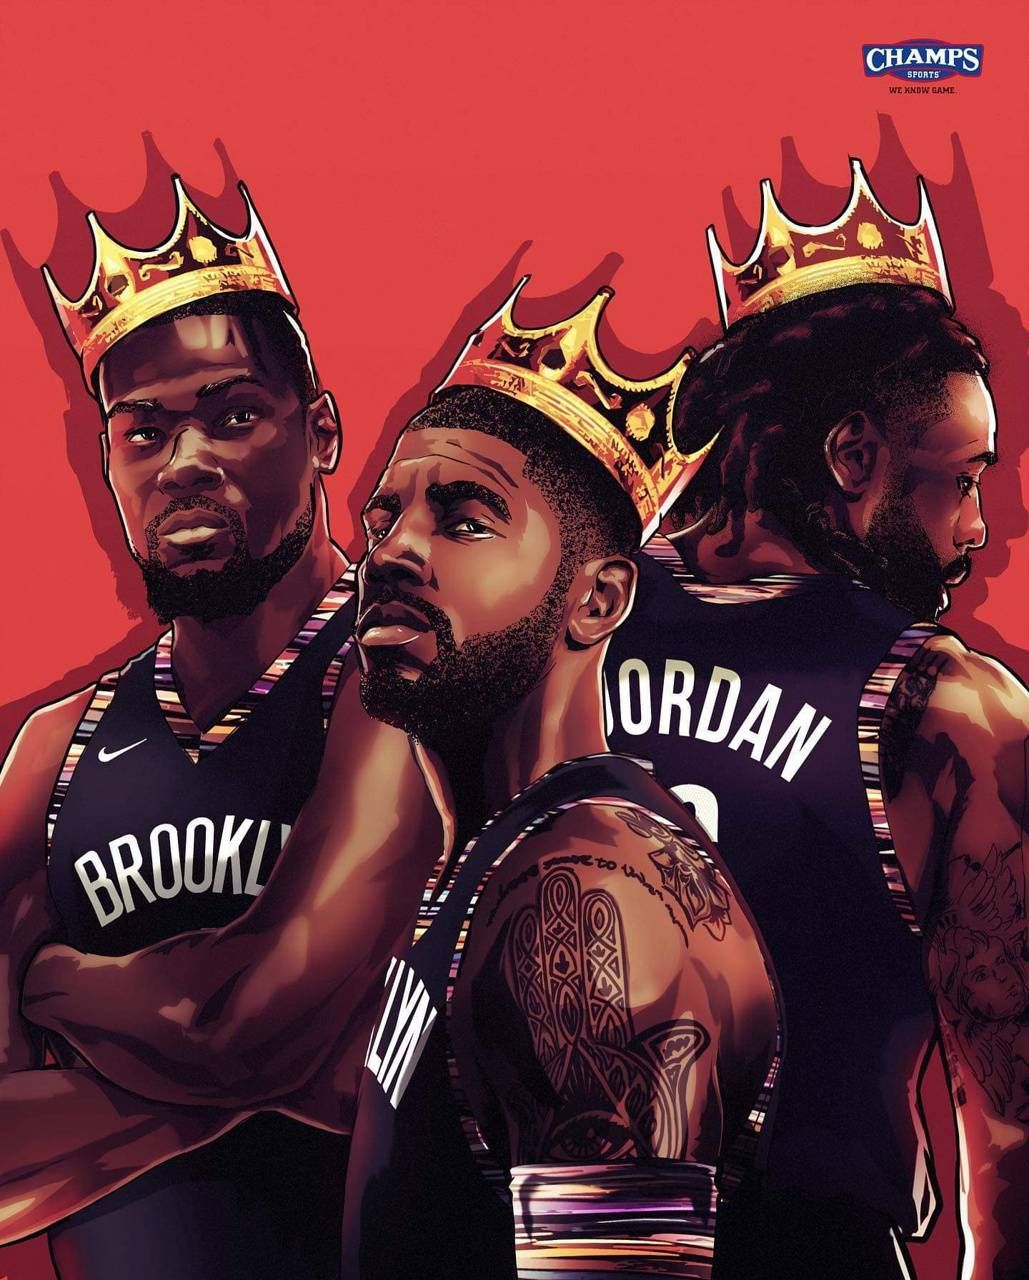 Brooklyn Nets Kd Kyrie Dj Kings Biggie Wallpaper Basketball Players Nba Nba Basketball Art Nba Mvp